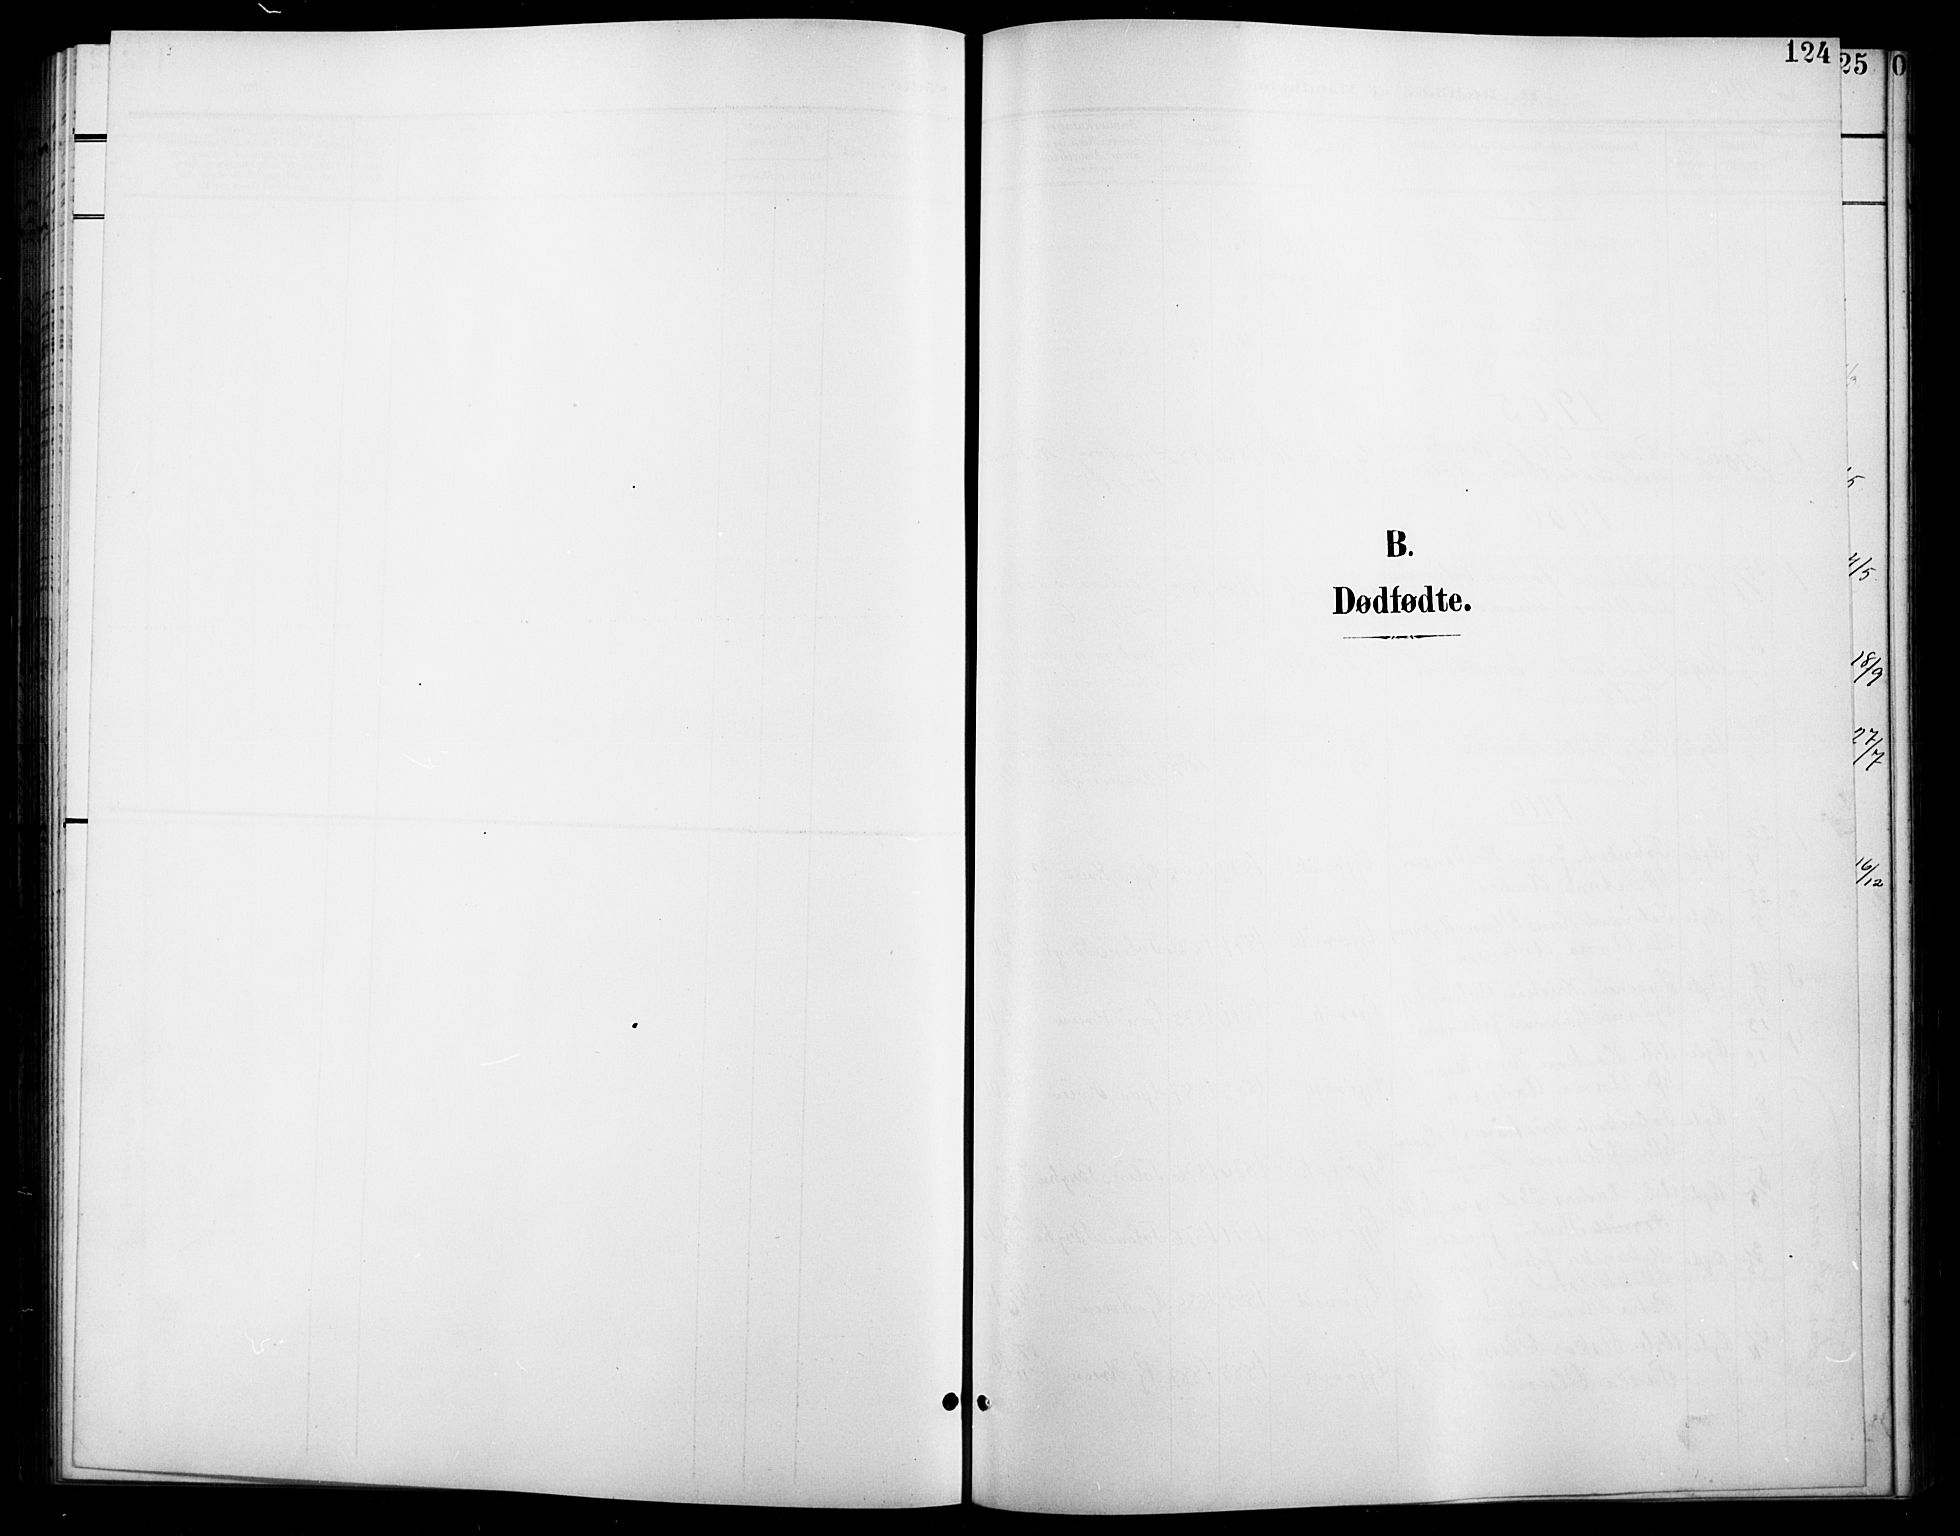 SAH, Vardal prestekontor, H/Ha/Hab/L0012: Klokkerbok nr. 12, 1902-1911, s. 124